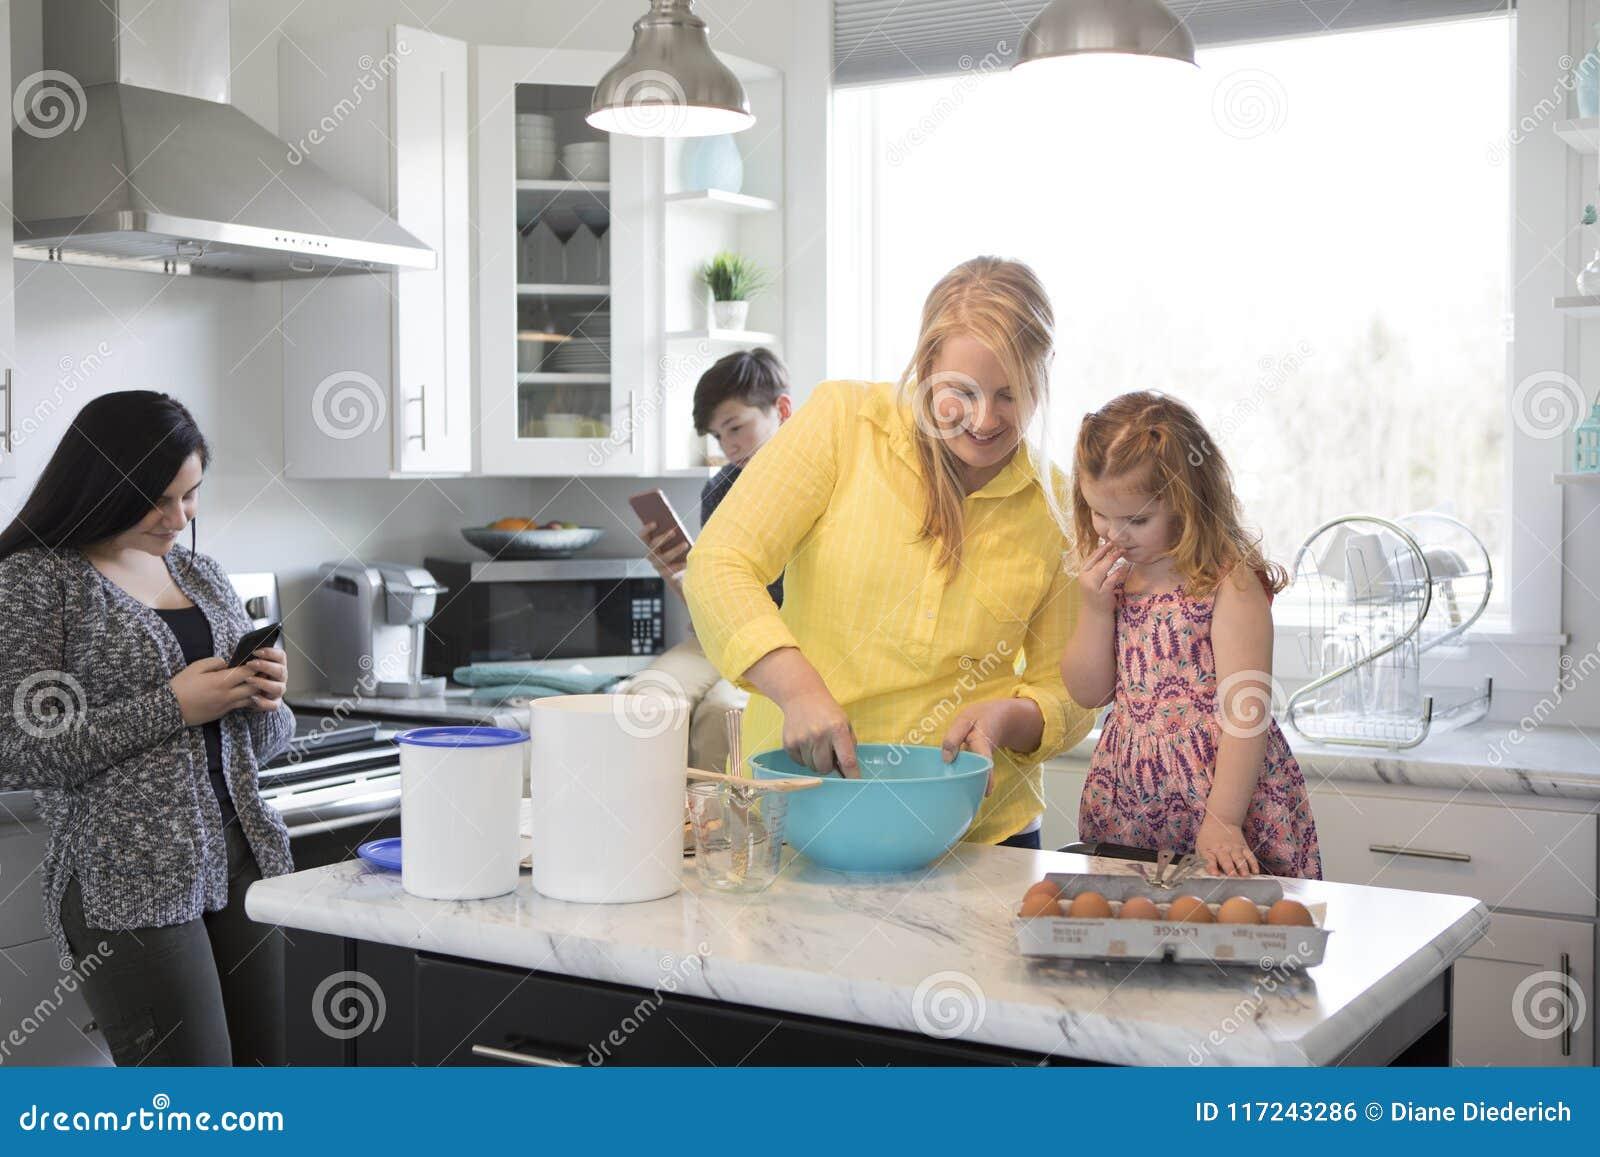 Familia en la cocina junto